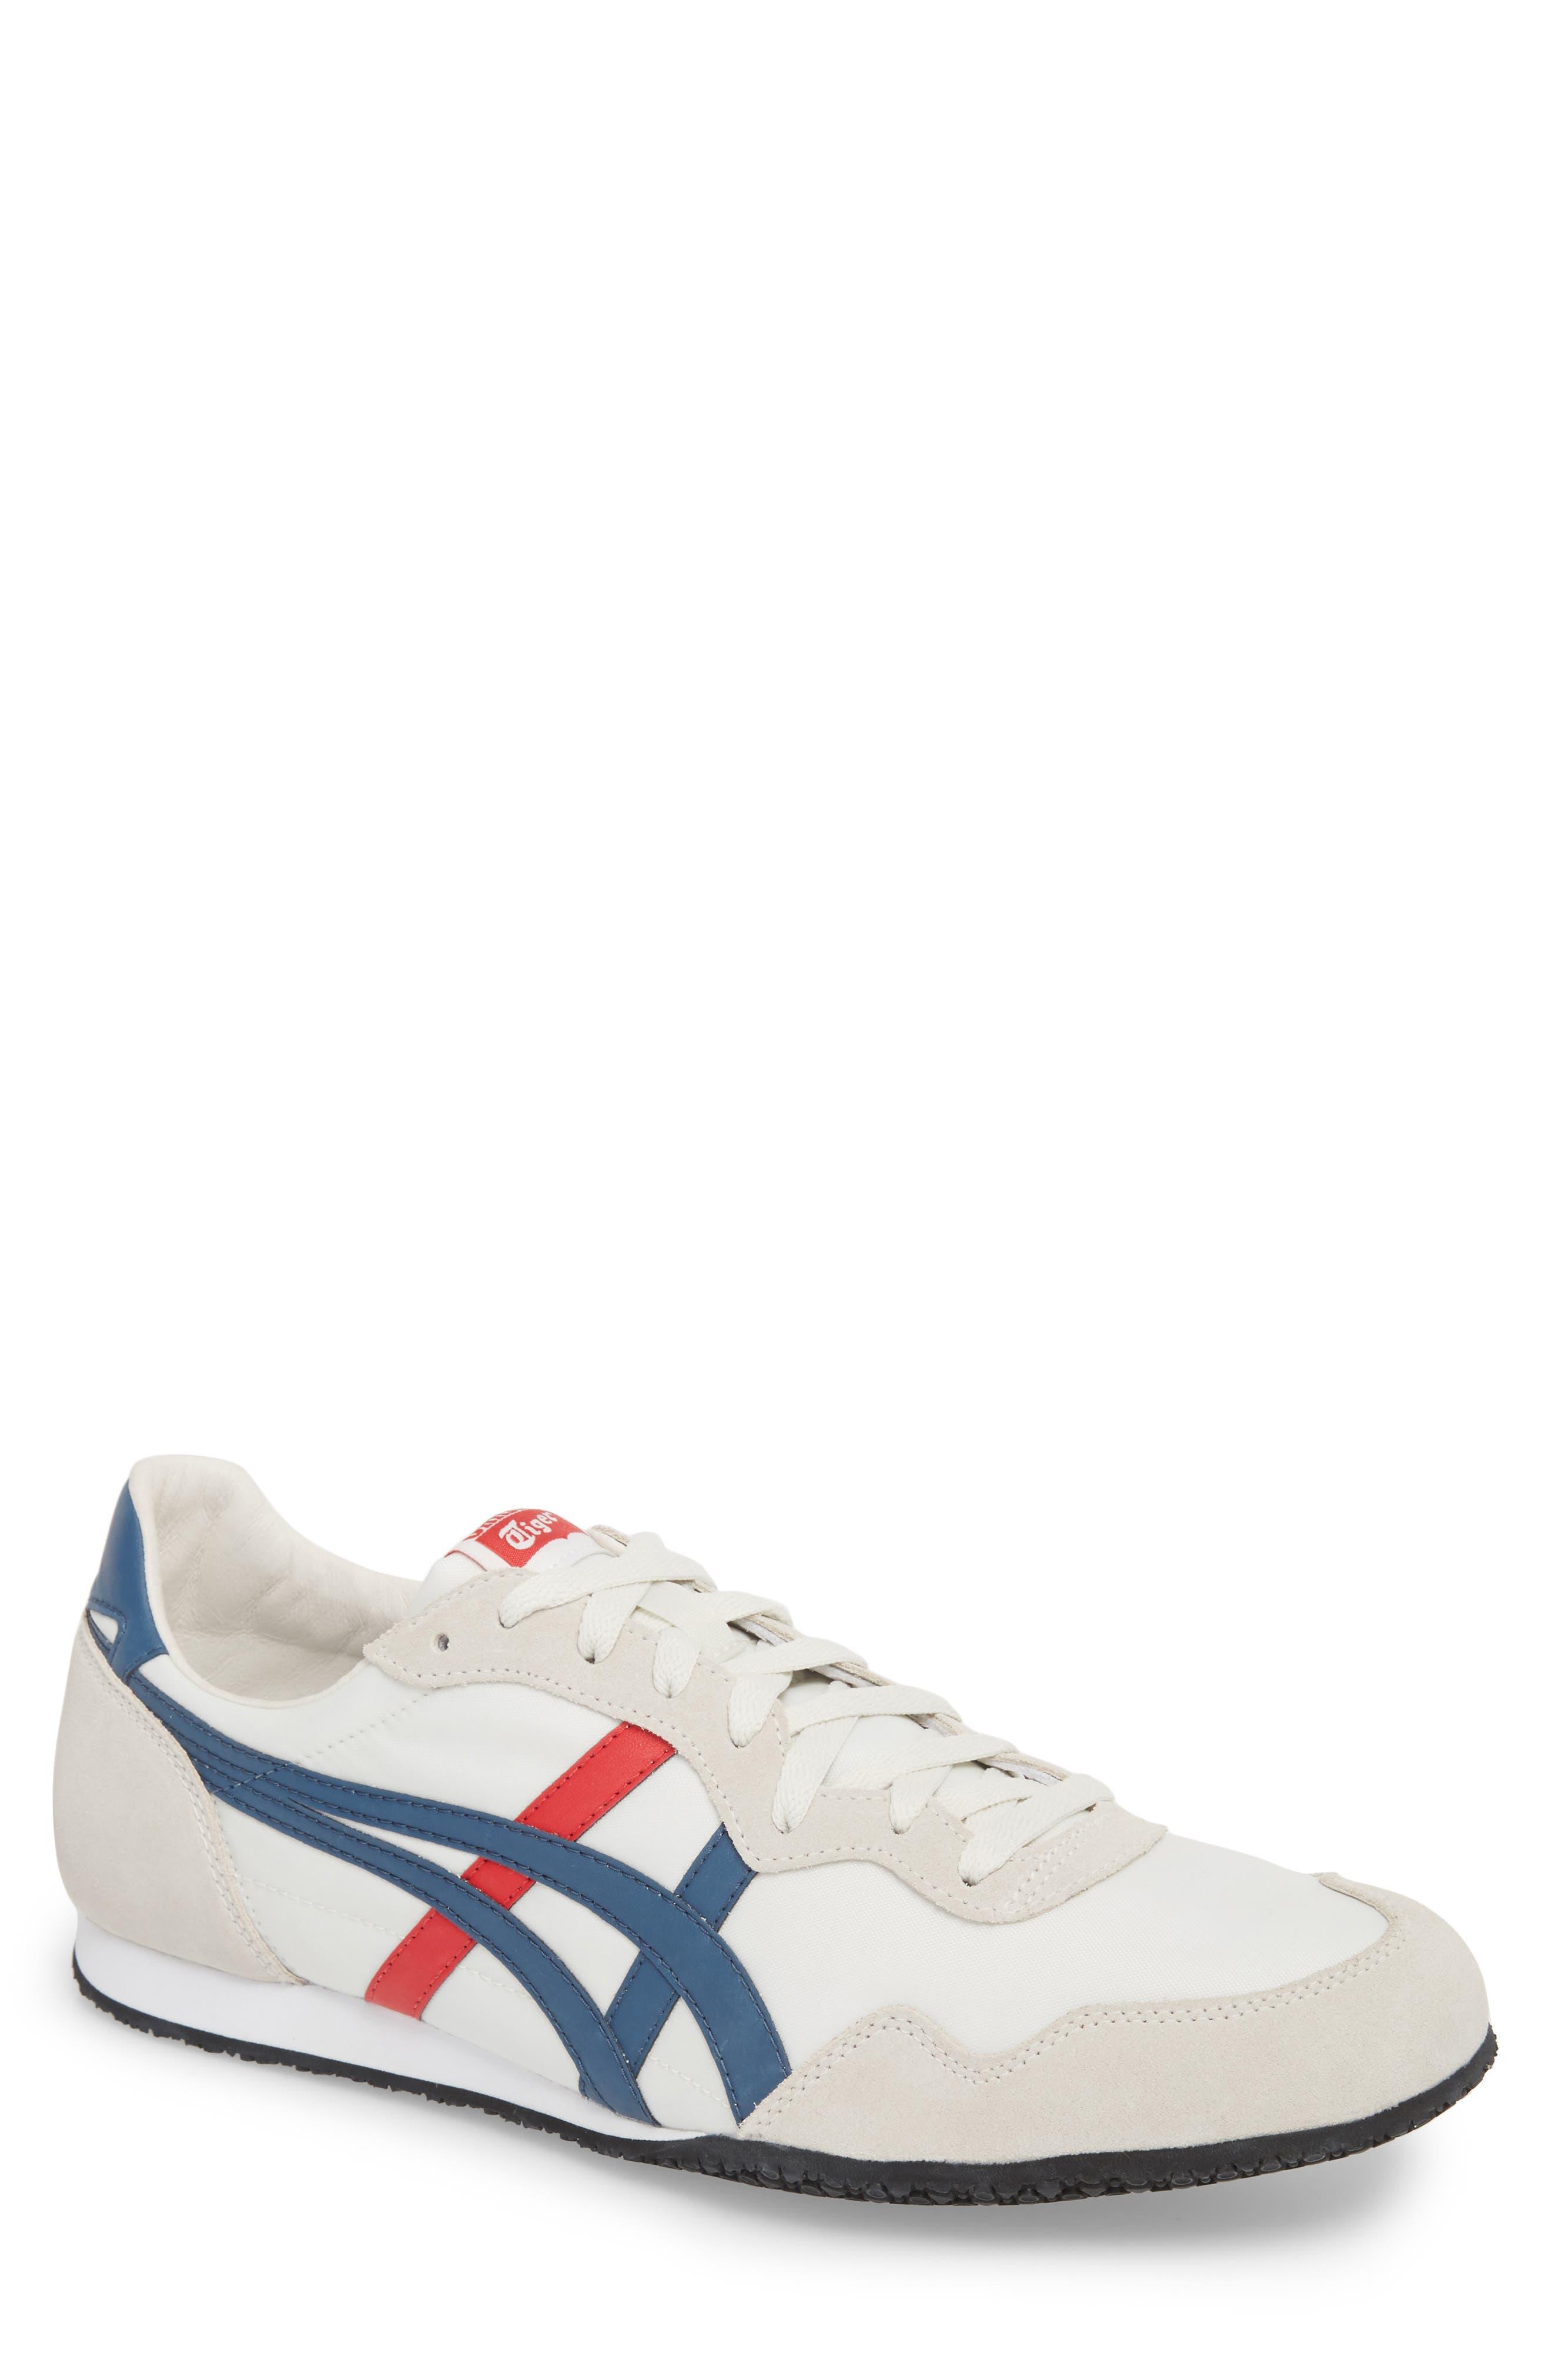 'Serrano' Sneaker,                             Main thumbnail 1, color,                             White/ Mallard Blue